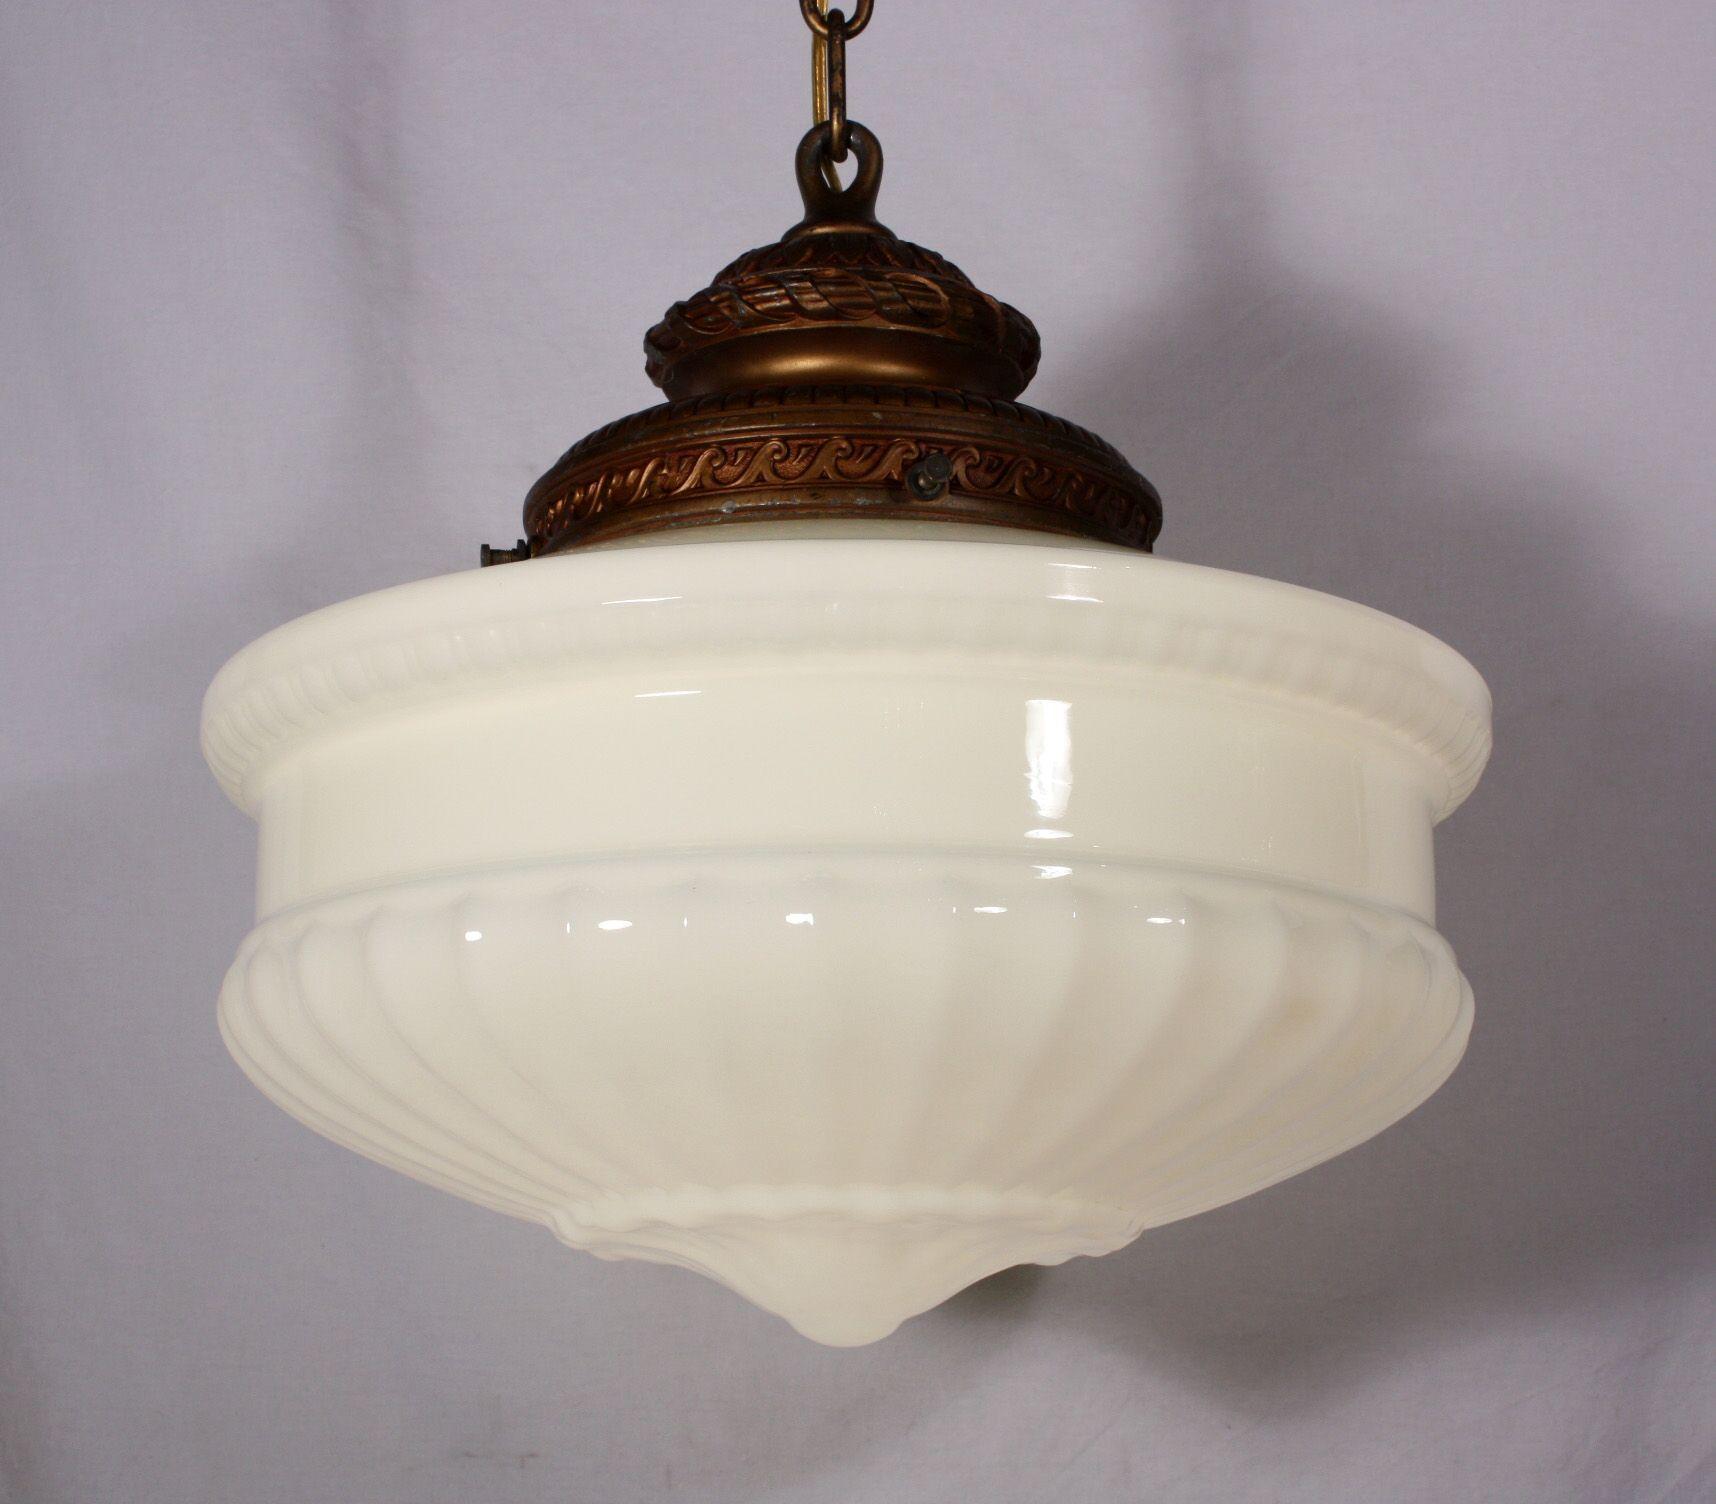 1000 images about livingroom light fixtures for 1930s house on pinterest ceiling light fixtures glass ceiling lights and vintage art antique kitchen lighting fixtures